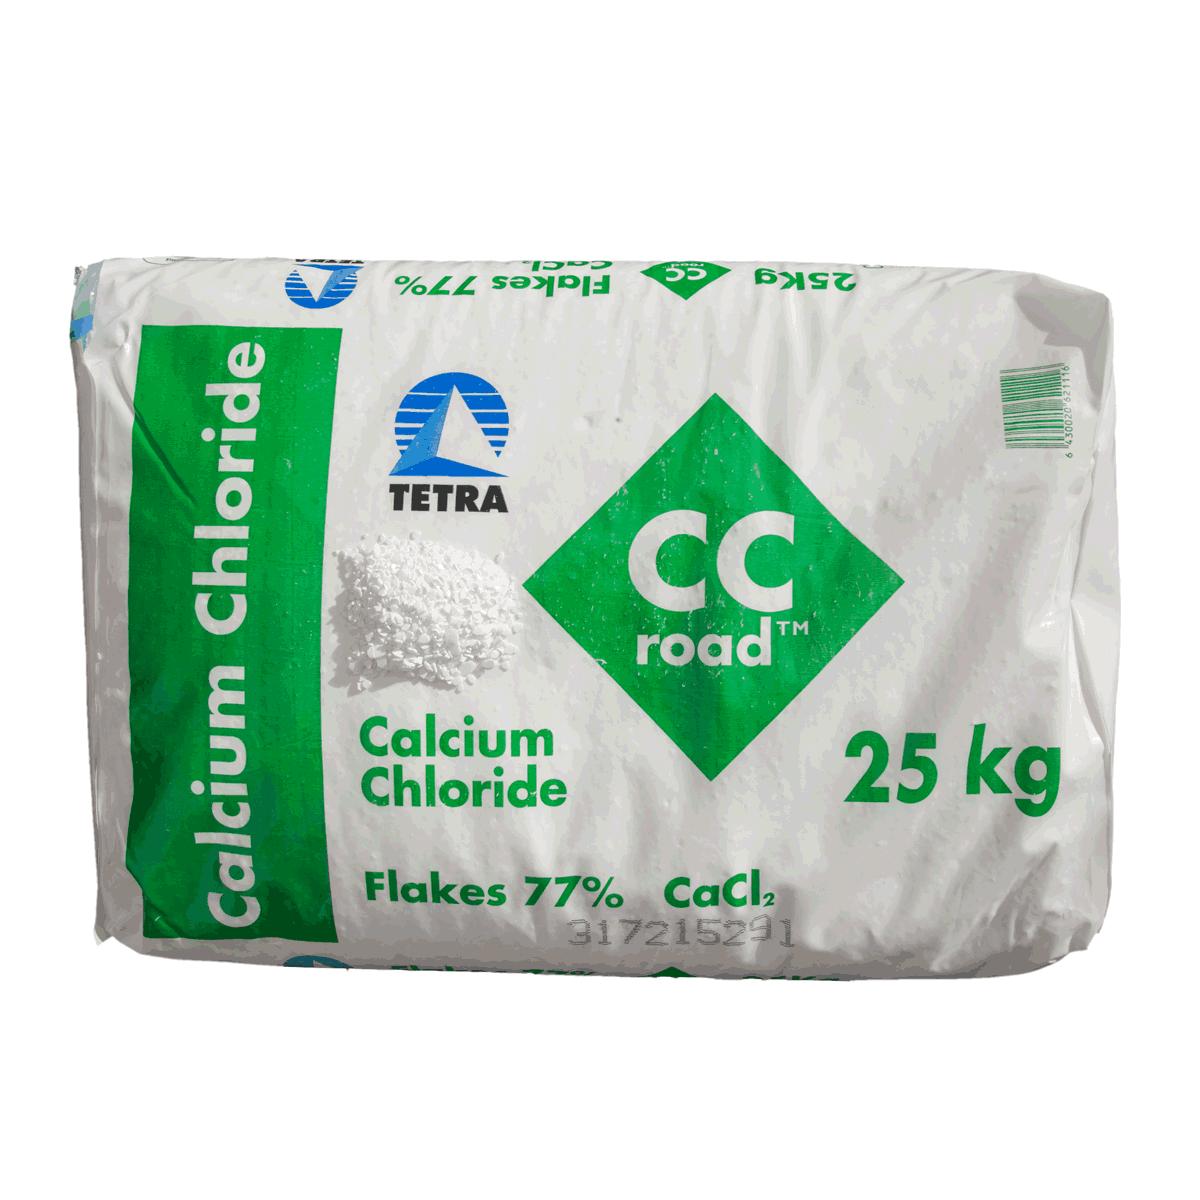 1 x 25 kg Calciumchlorid Streugranulat